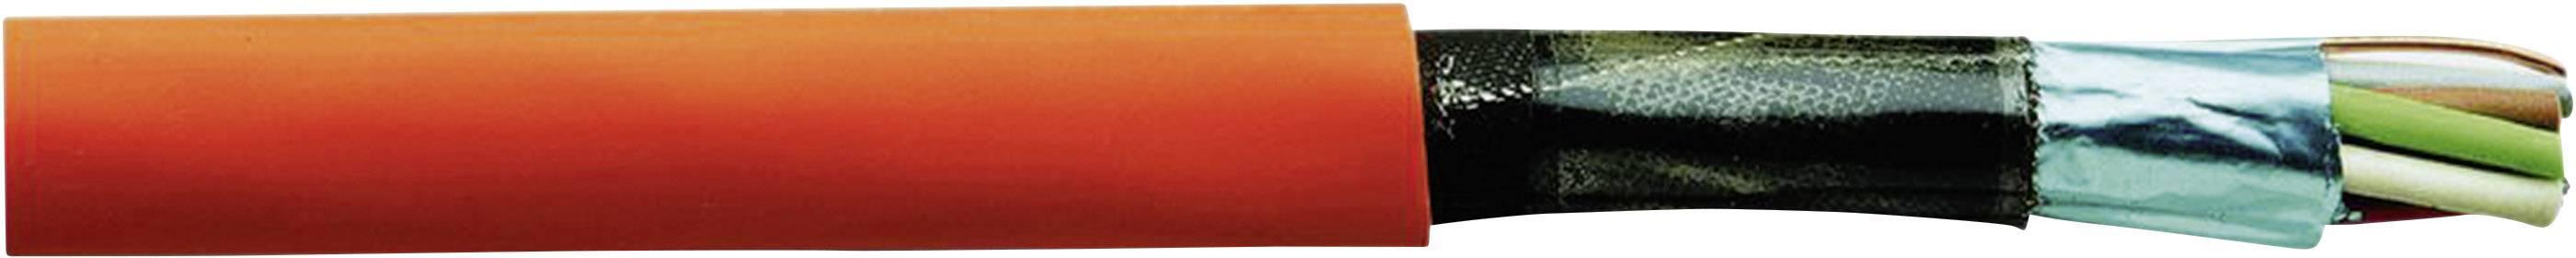 Kábel pre požiarne hlásiče JE-H(ST)H...BD...E30-E90 Faber Kabel JE-H(ST)H...BD...E30-E90 100275, 2 x 2 x 0.8 mm, oranžová, metrový tovar